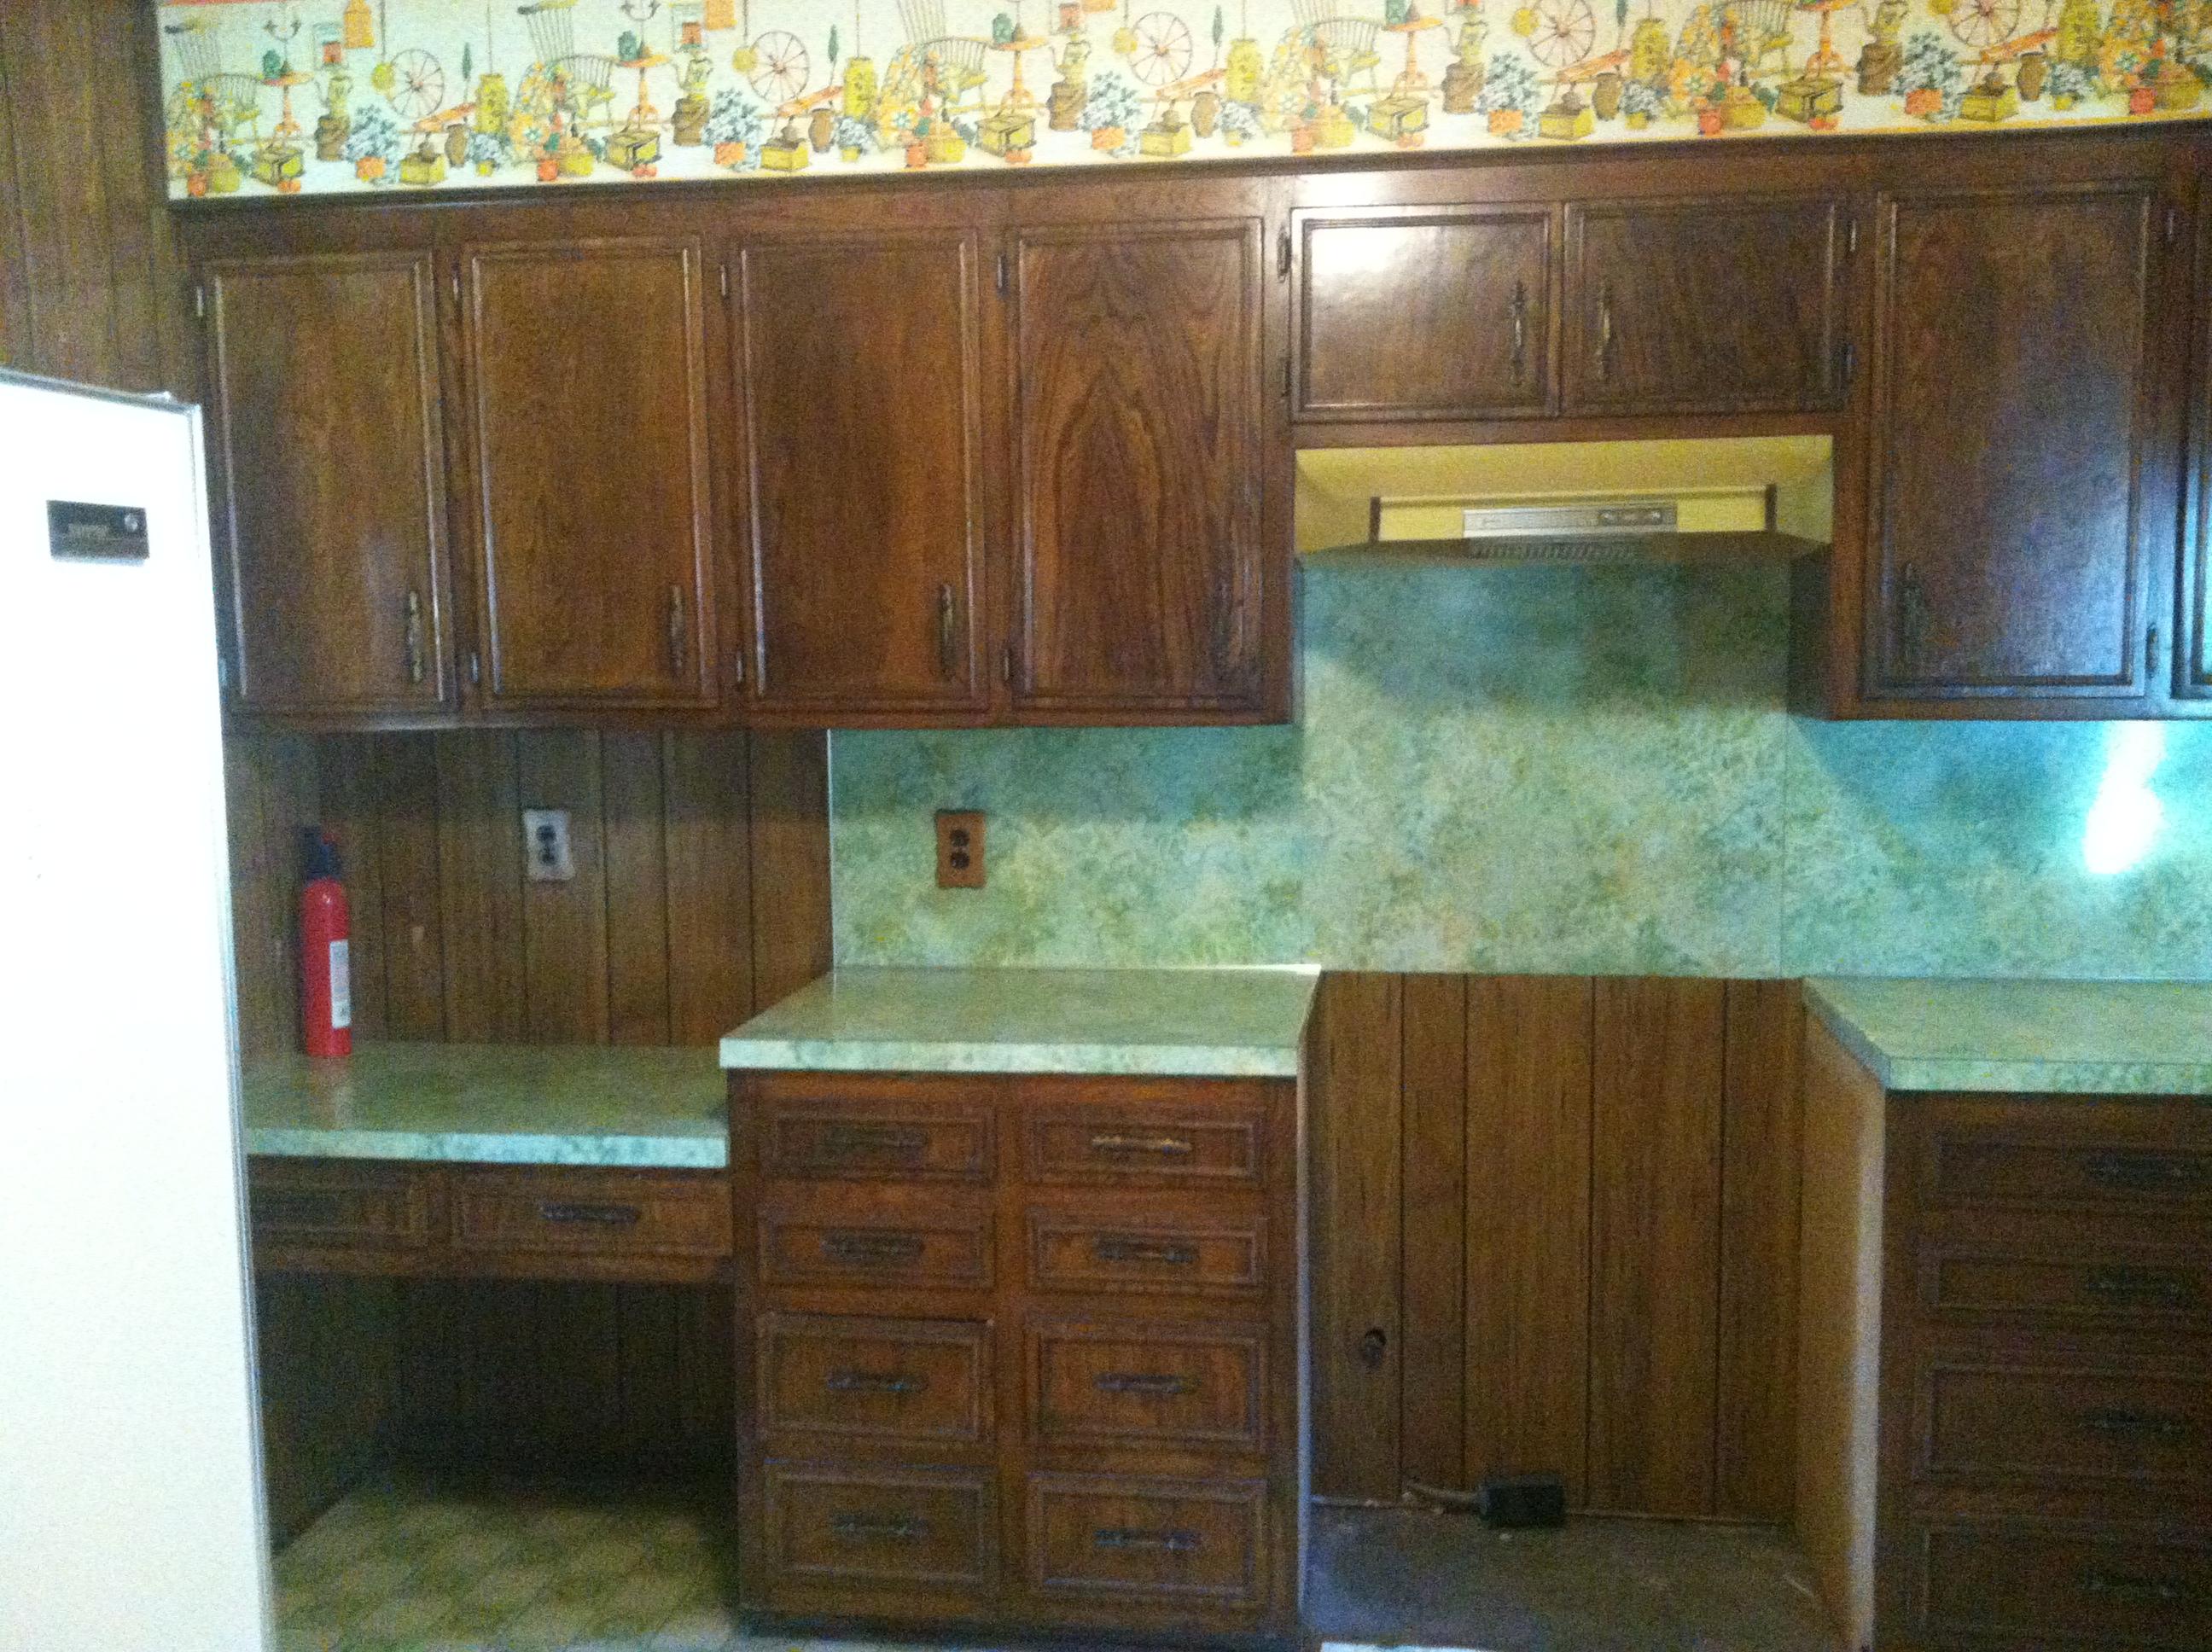 DIY Kitchen Backsplash Tutorial